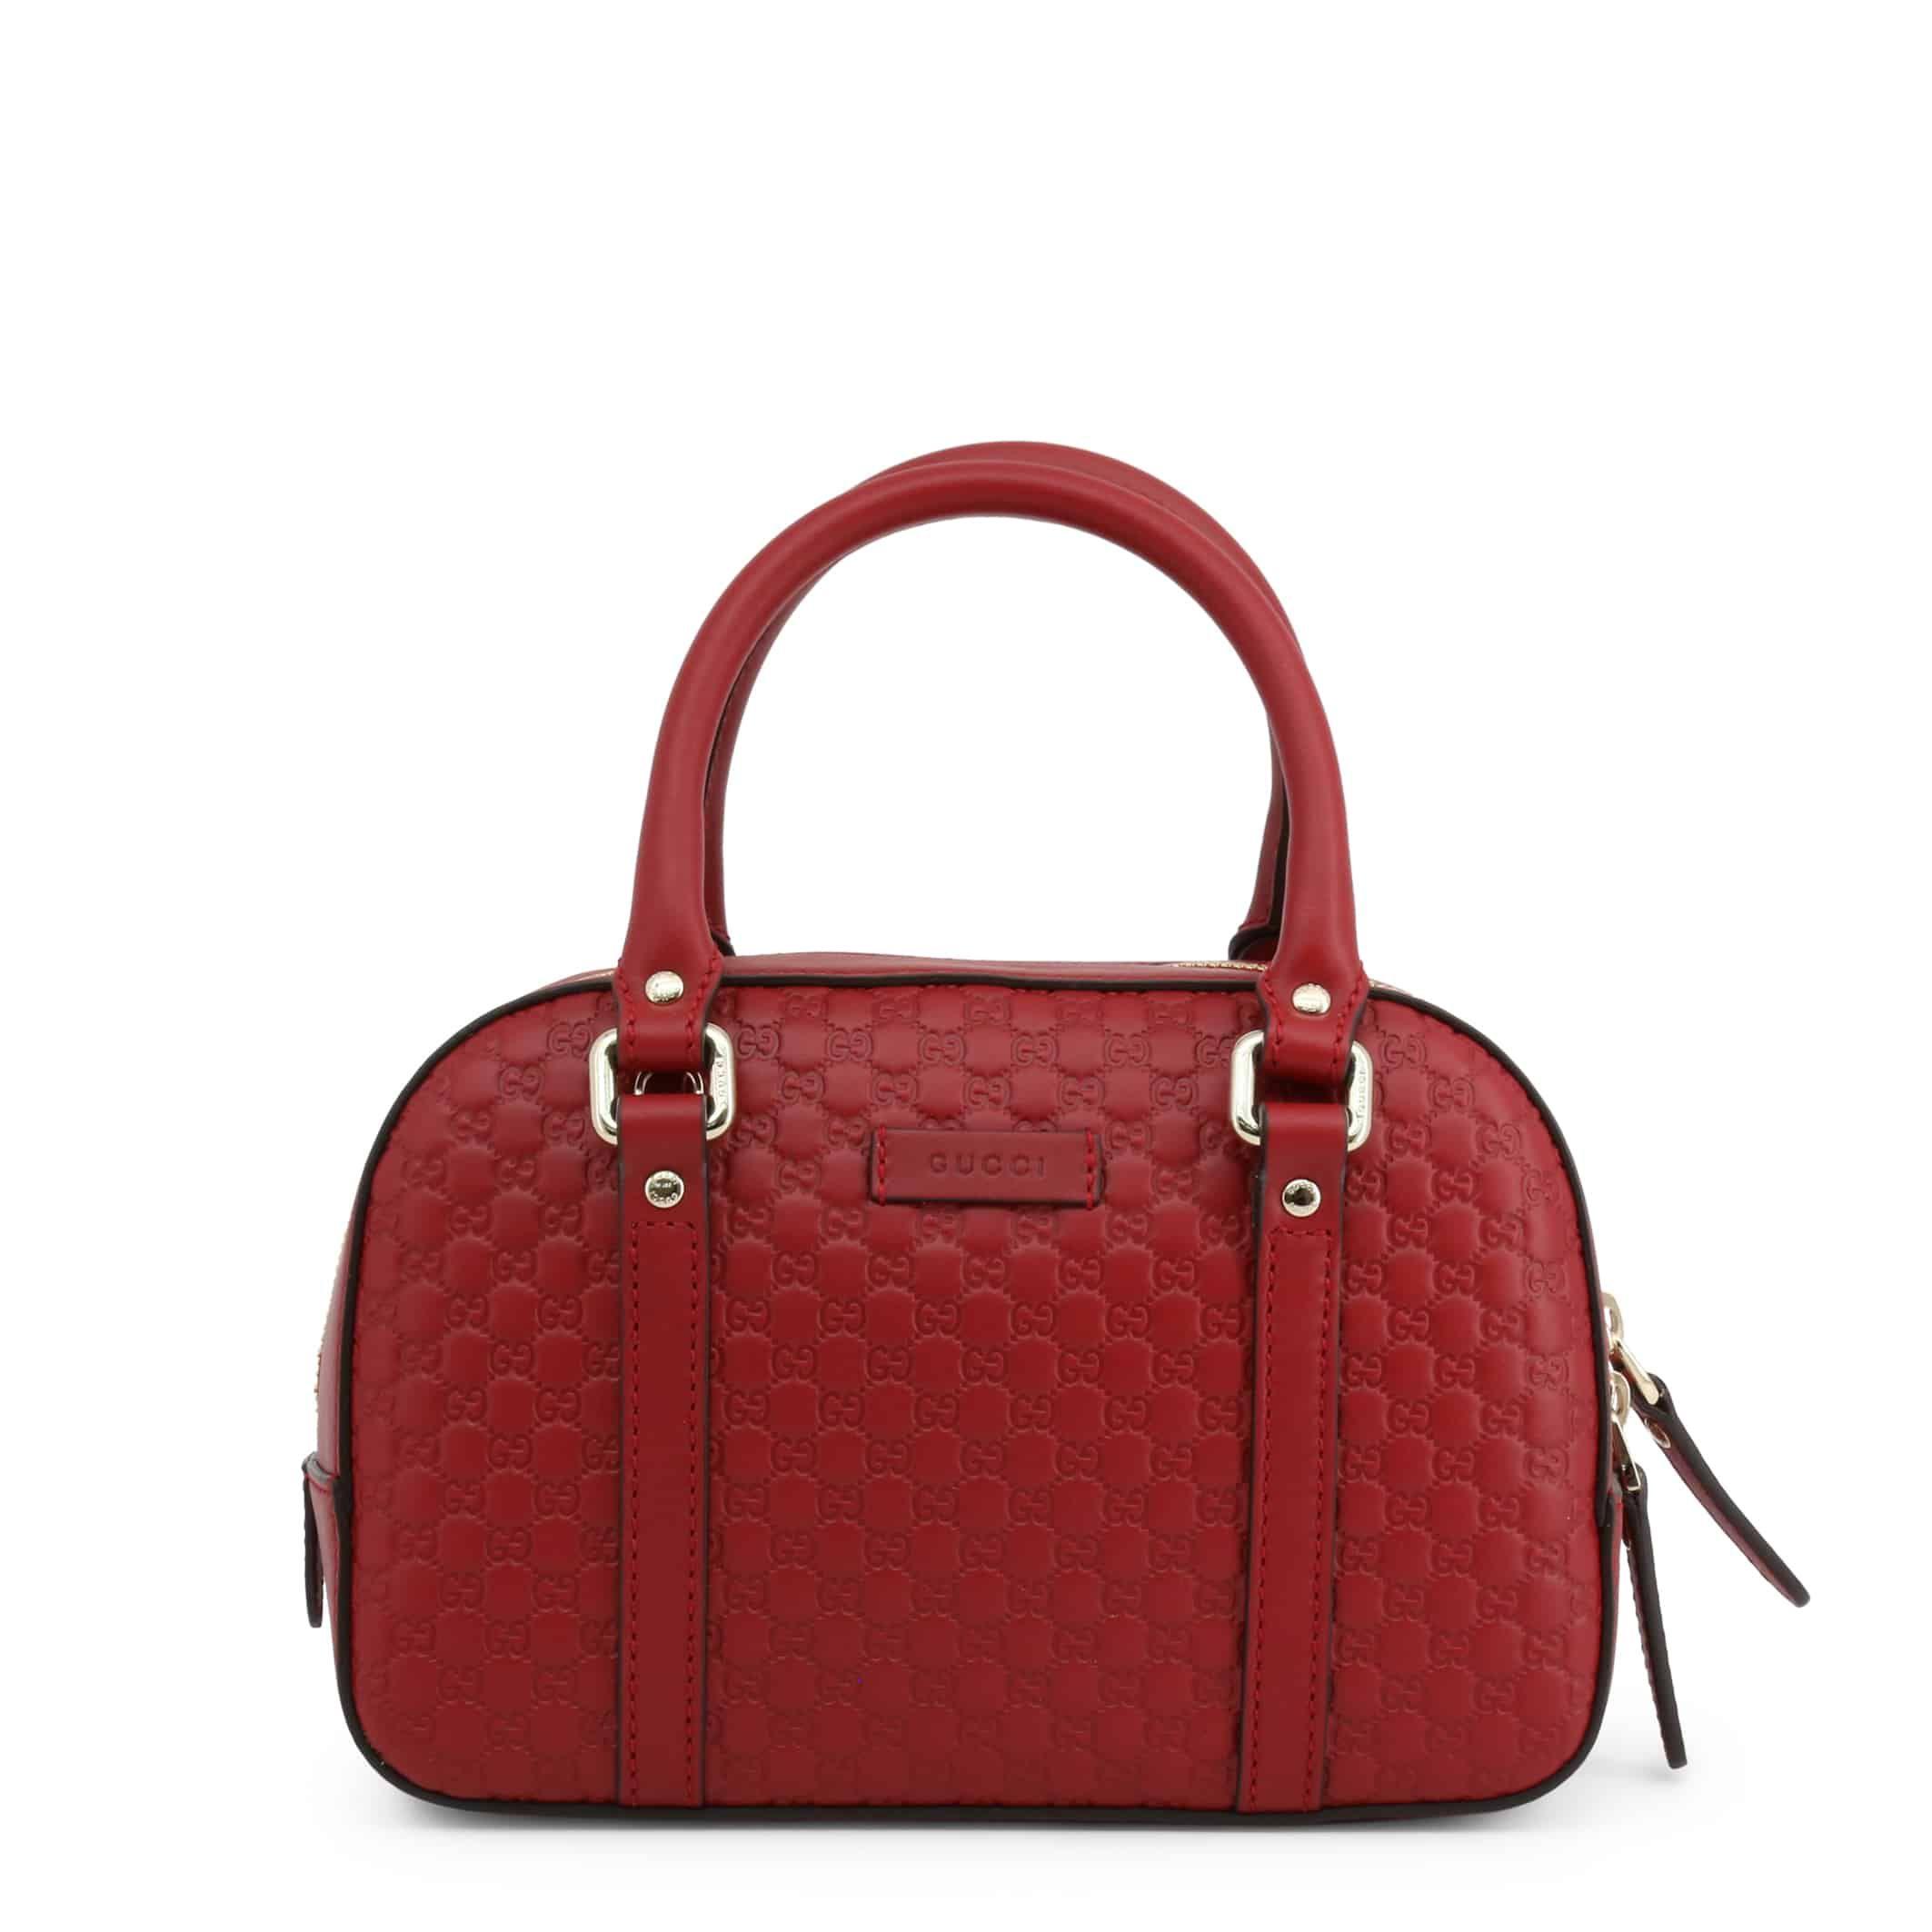 Gucci – 510289_BMJ1G